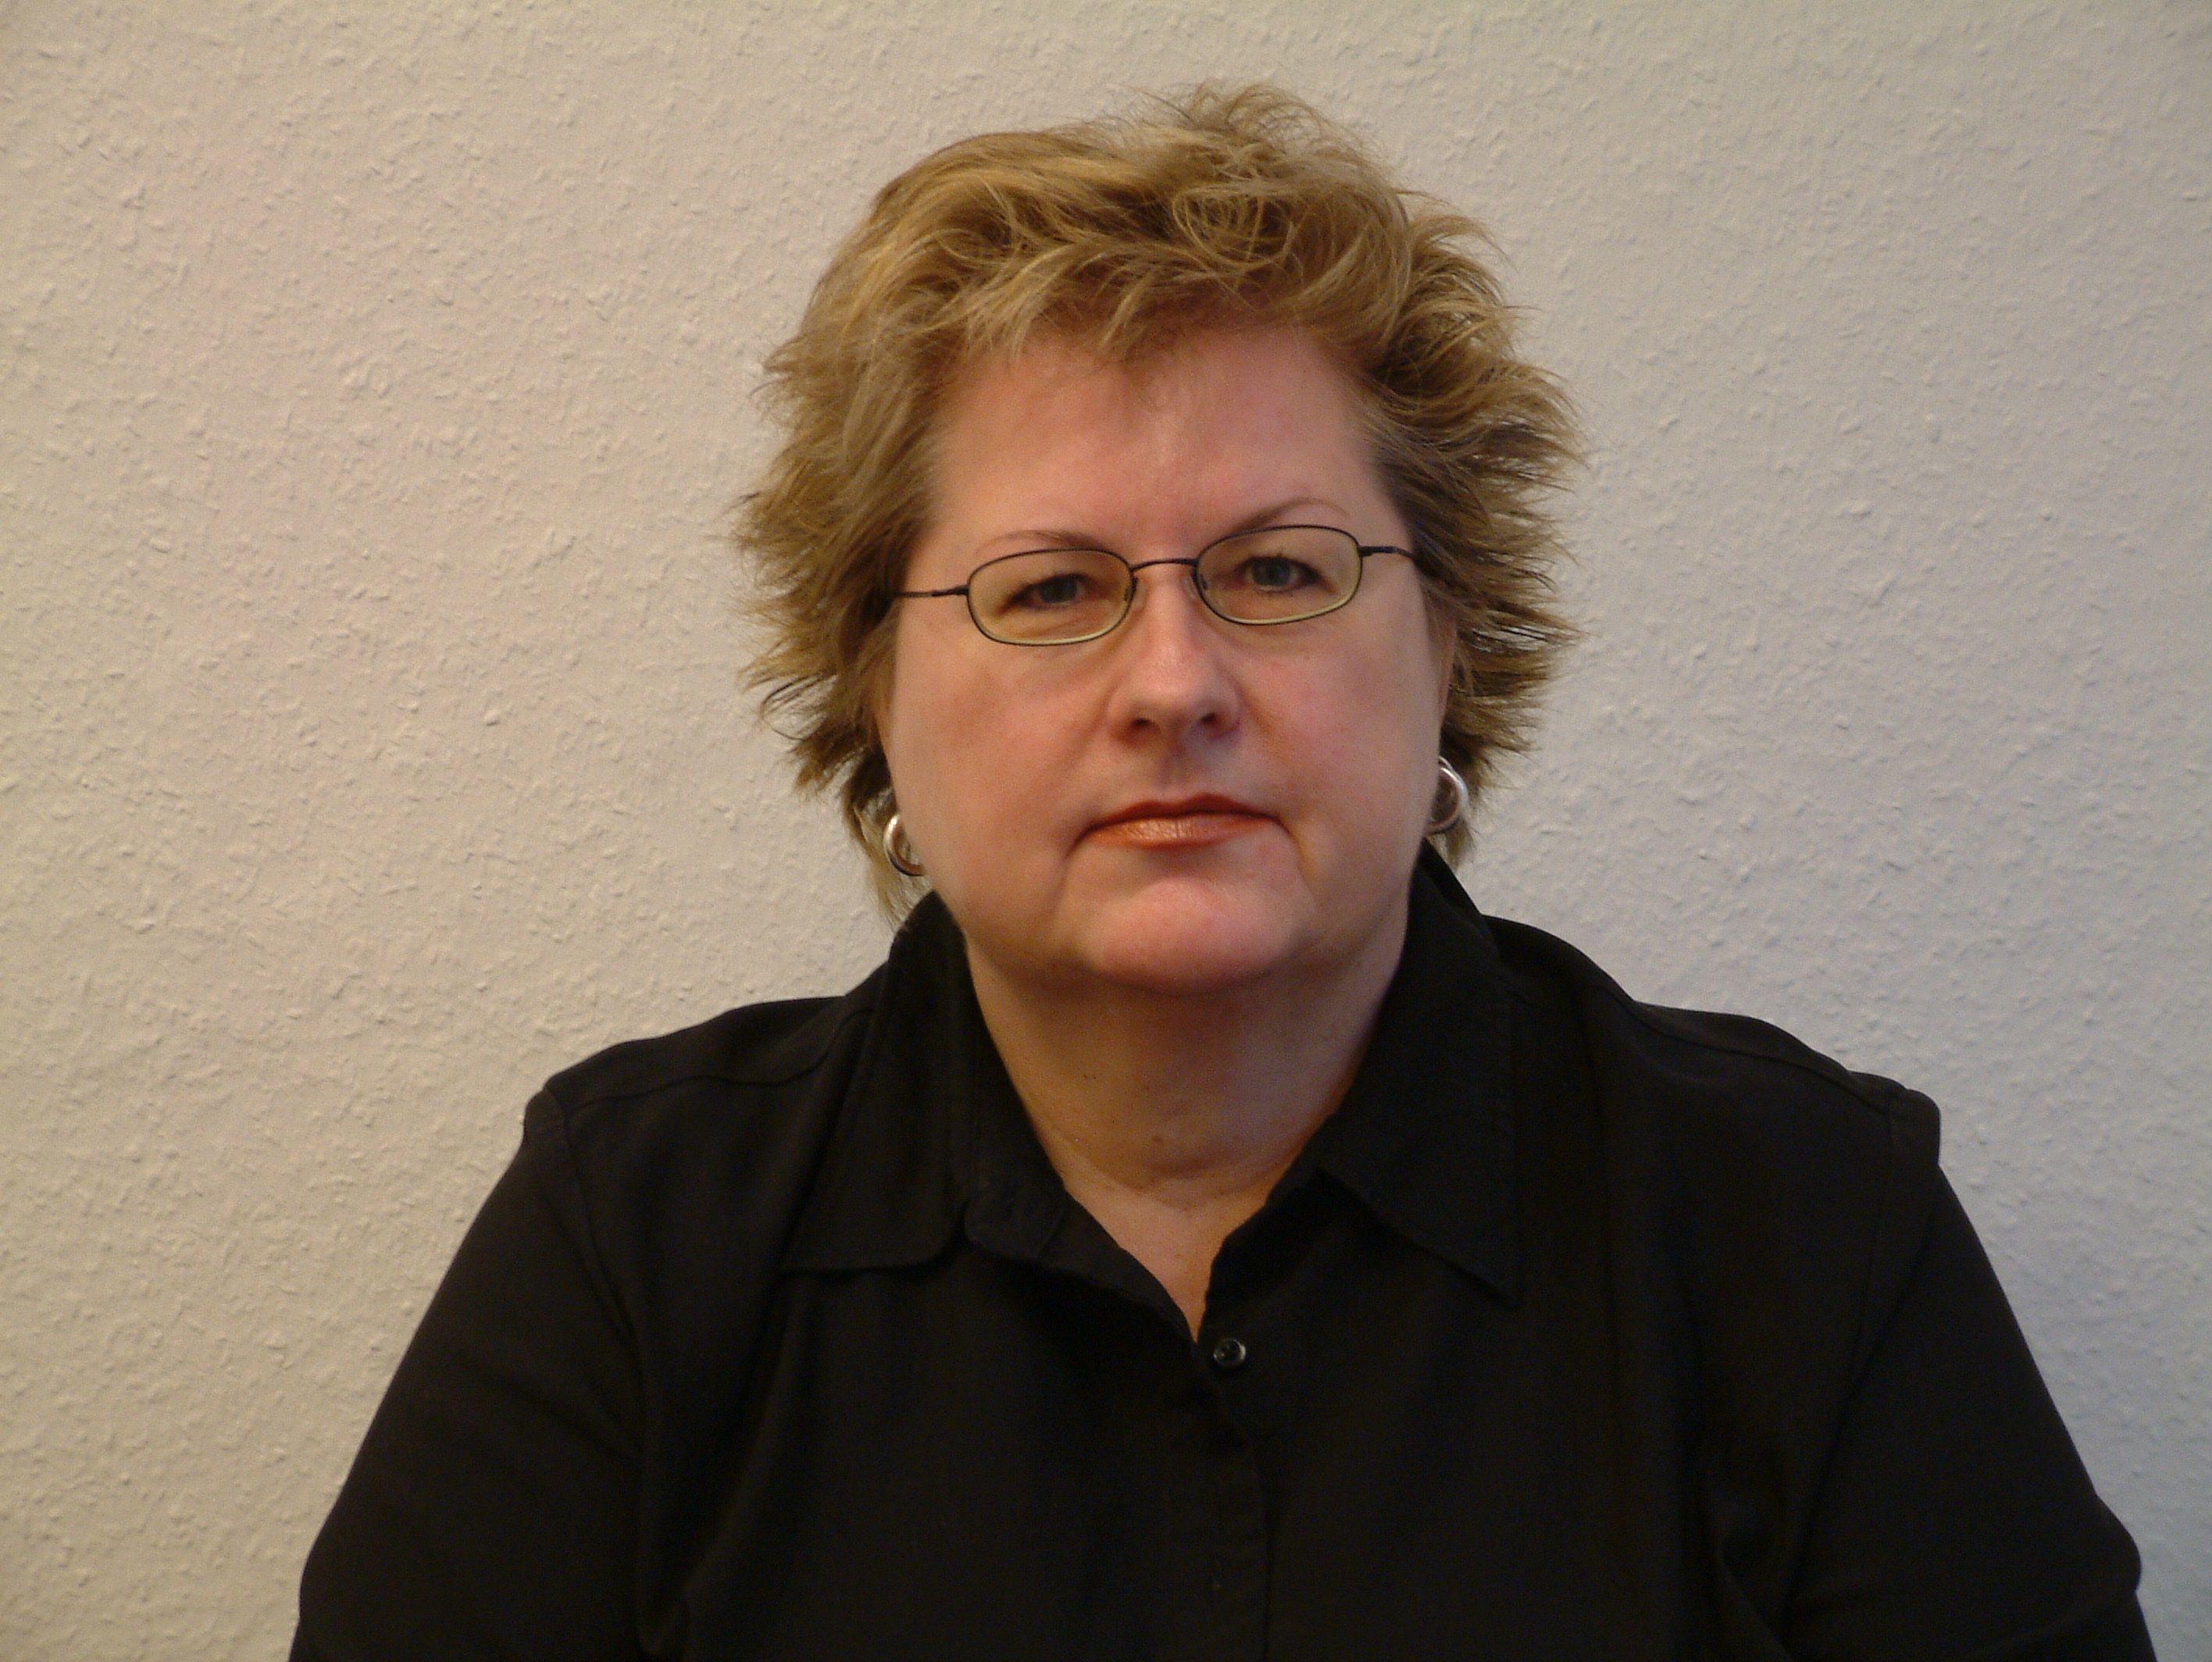 Evelyn Seiffert